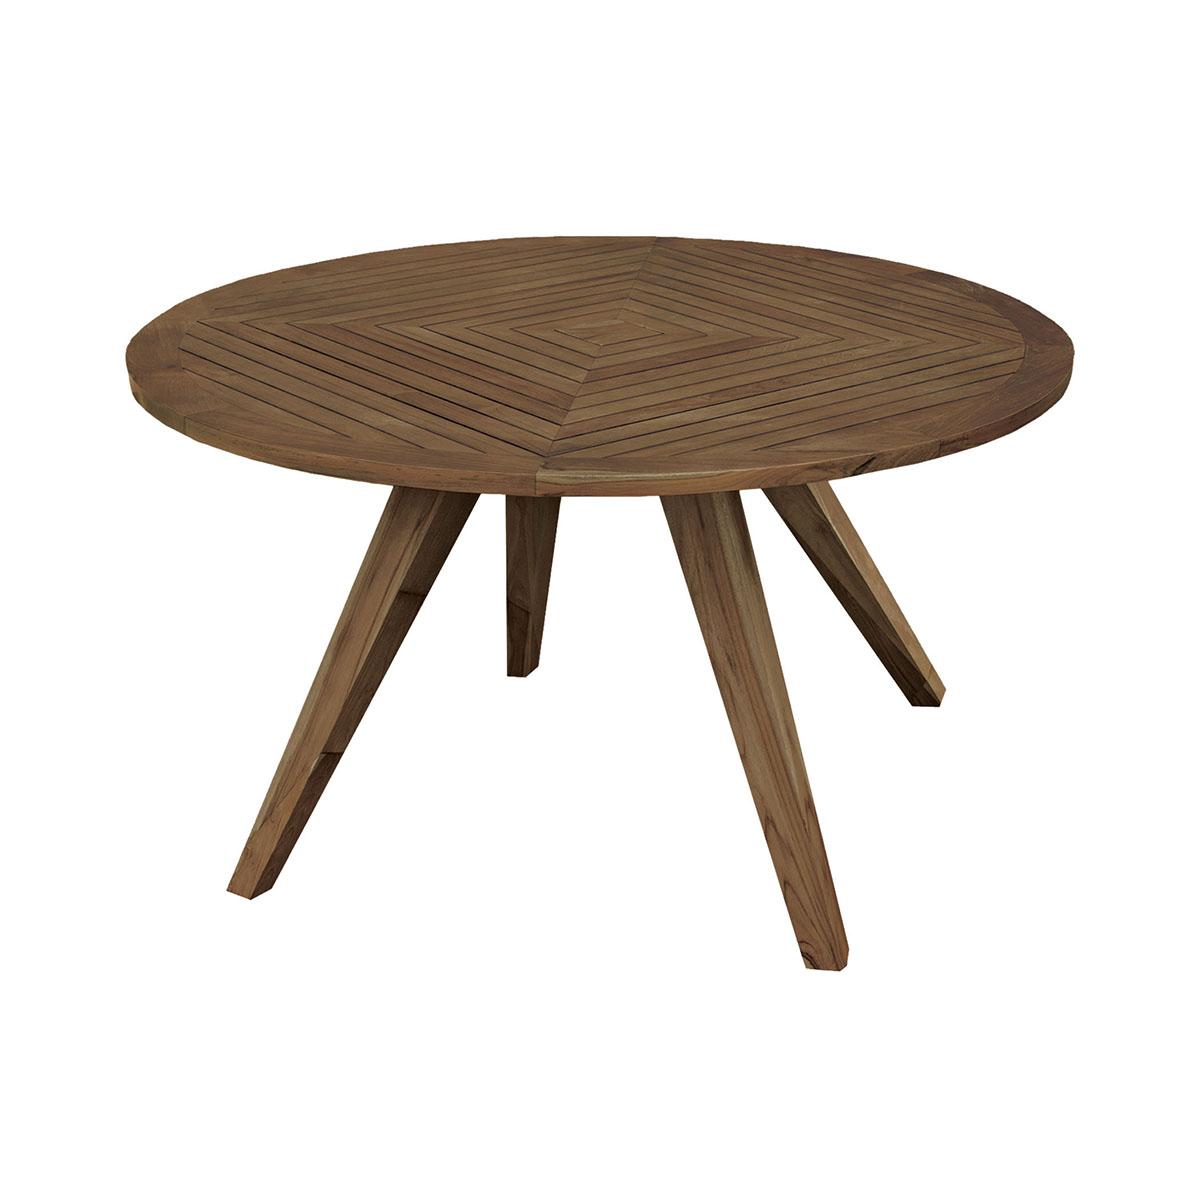 Round Teak Patio Table 7117517BU   ELK Home